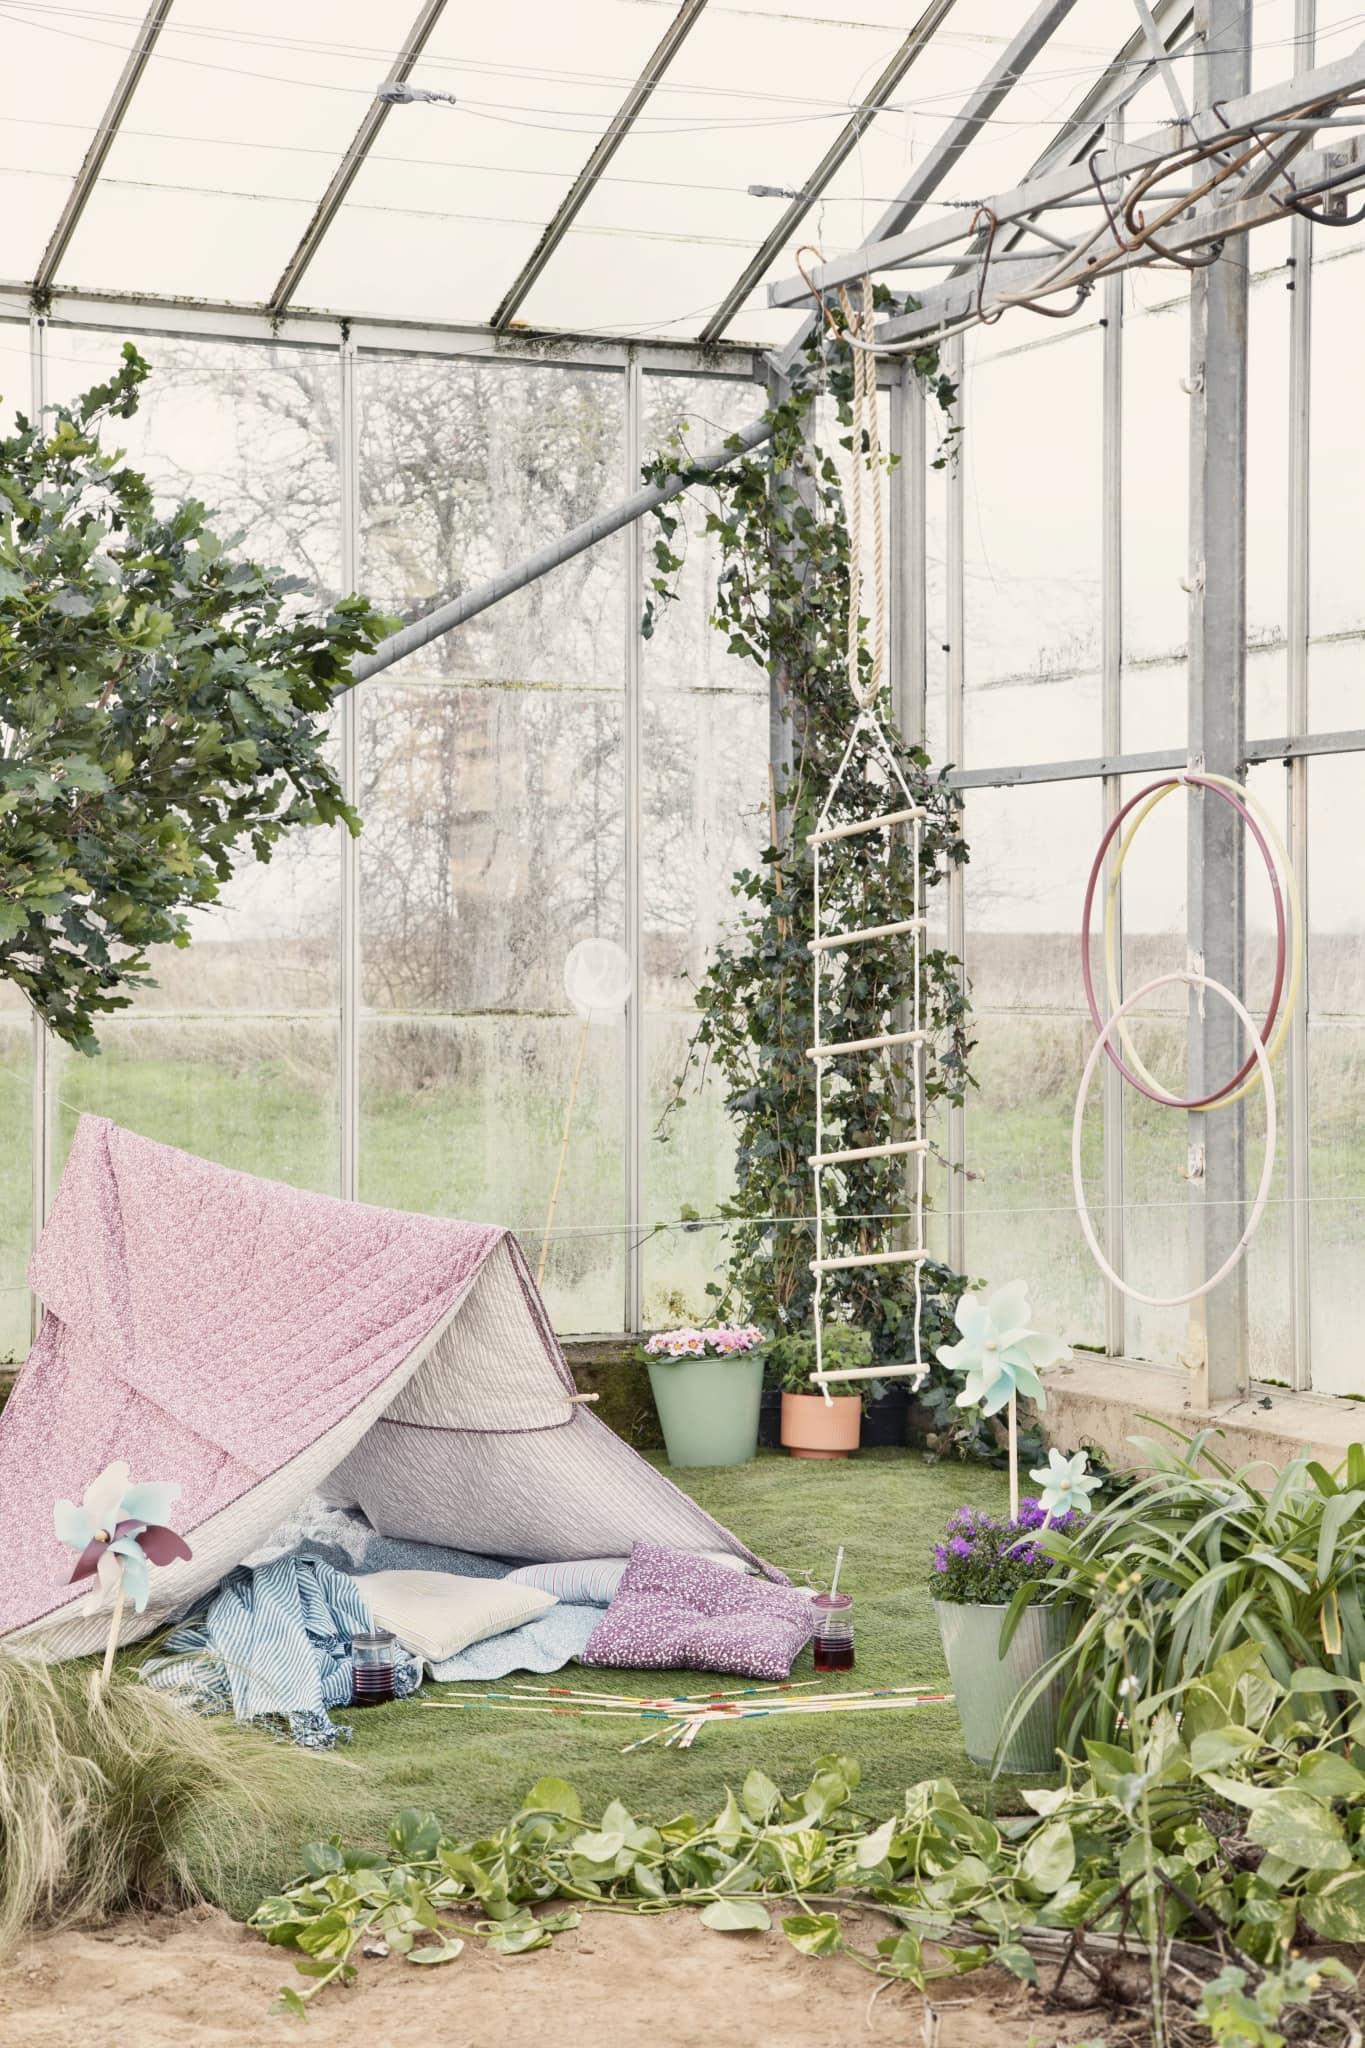 Søstrene Grene Buitenleven Collectie 2019